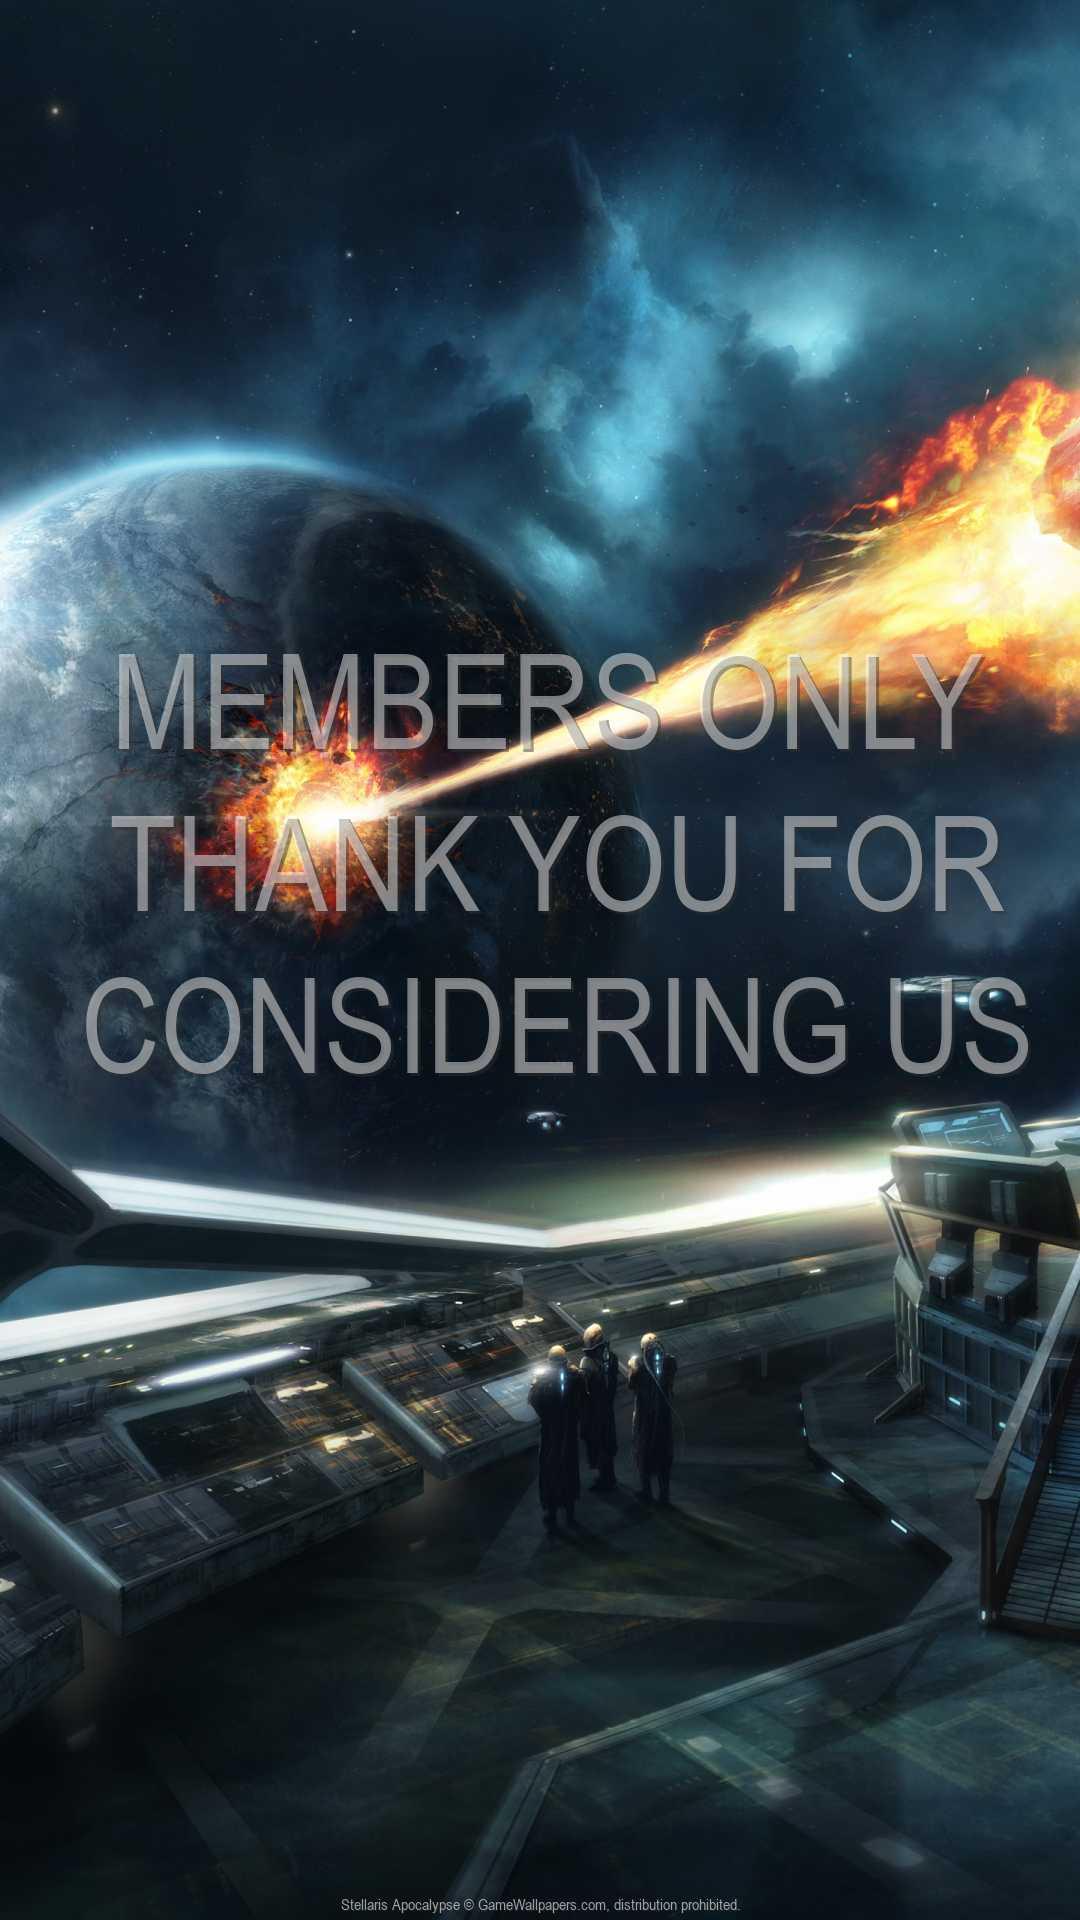 Stellaris: Apocalypse 1080p Vertical Mobile wallpaper or background 01